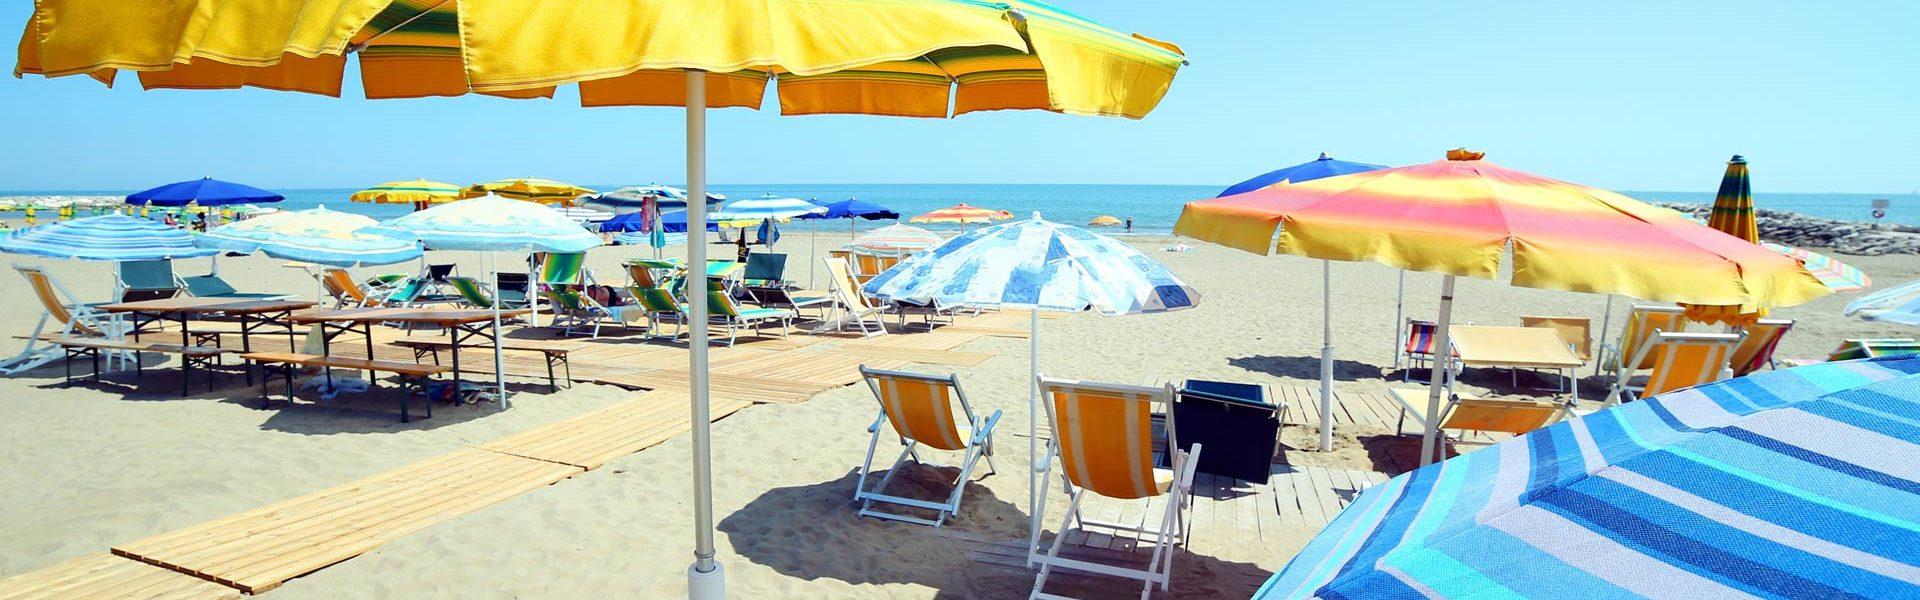 sieghart-reisen-spar-tipp-italien-igea-marina